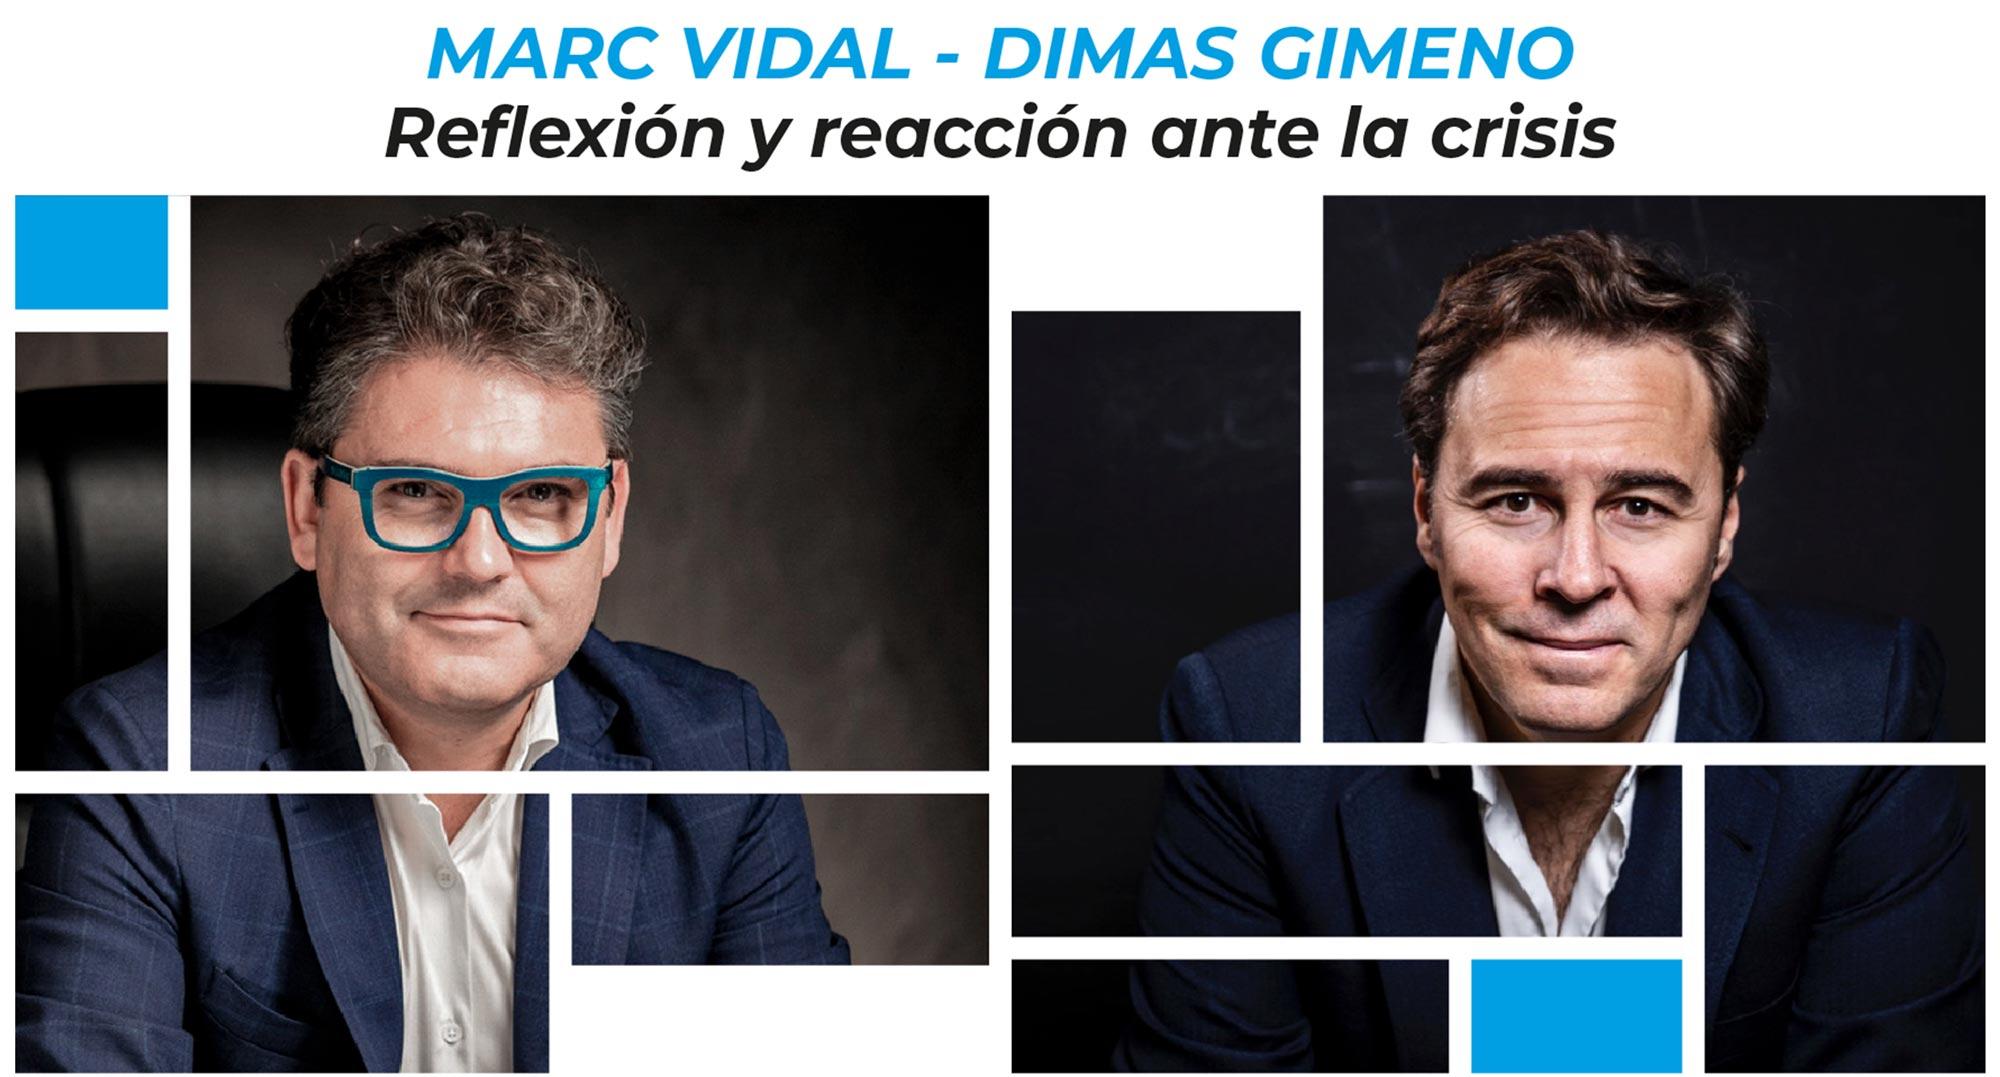 Foro Marc Vidal y Dimas Gimeno